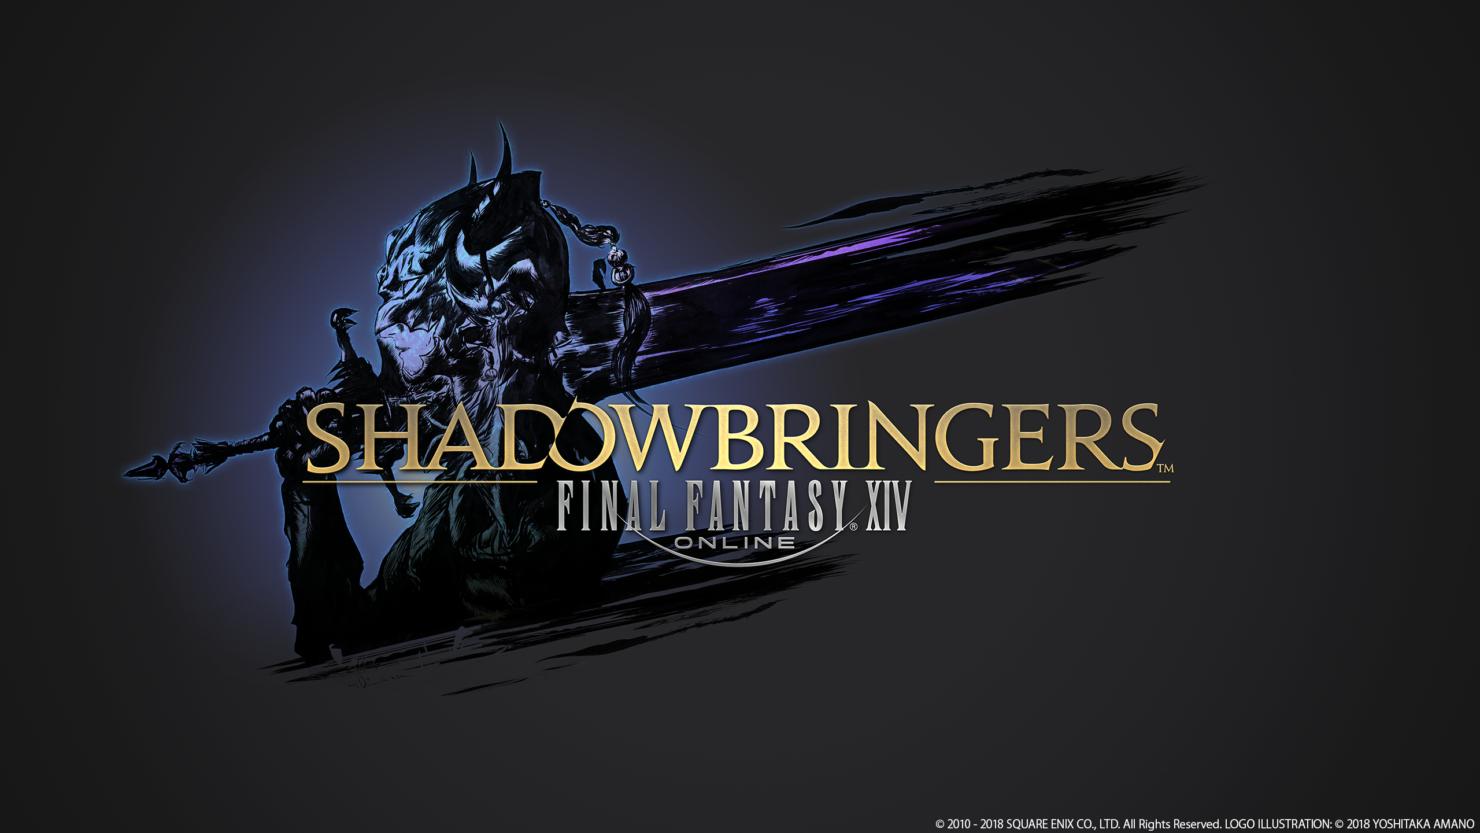 Final Fantsy XIV Shadowbringers